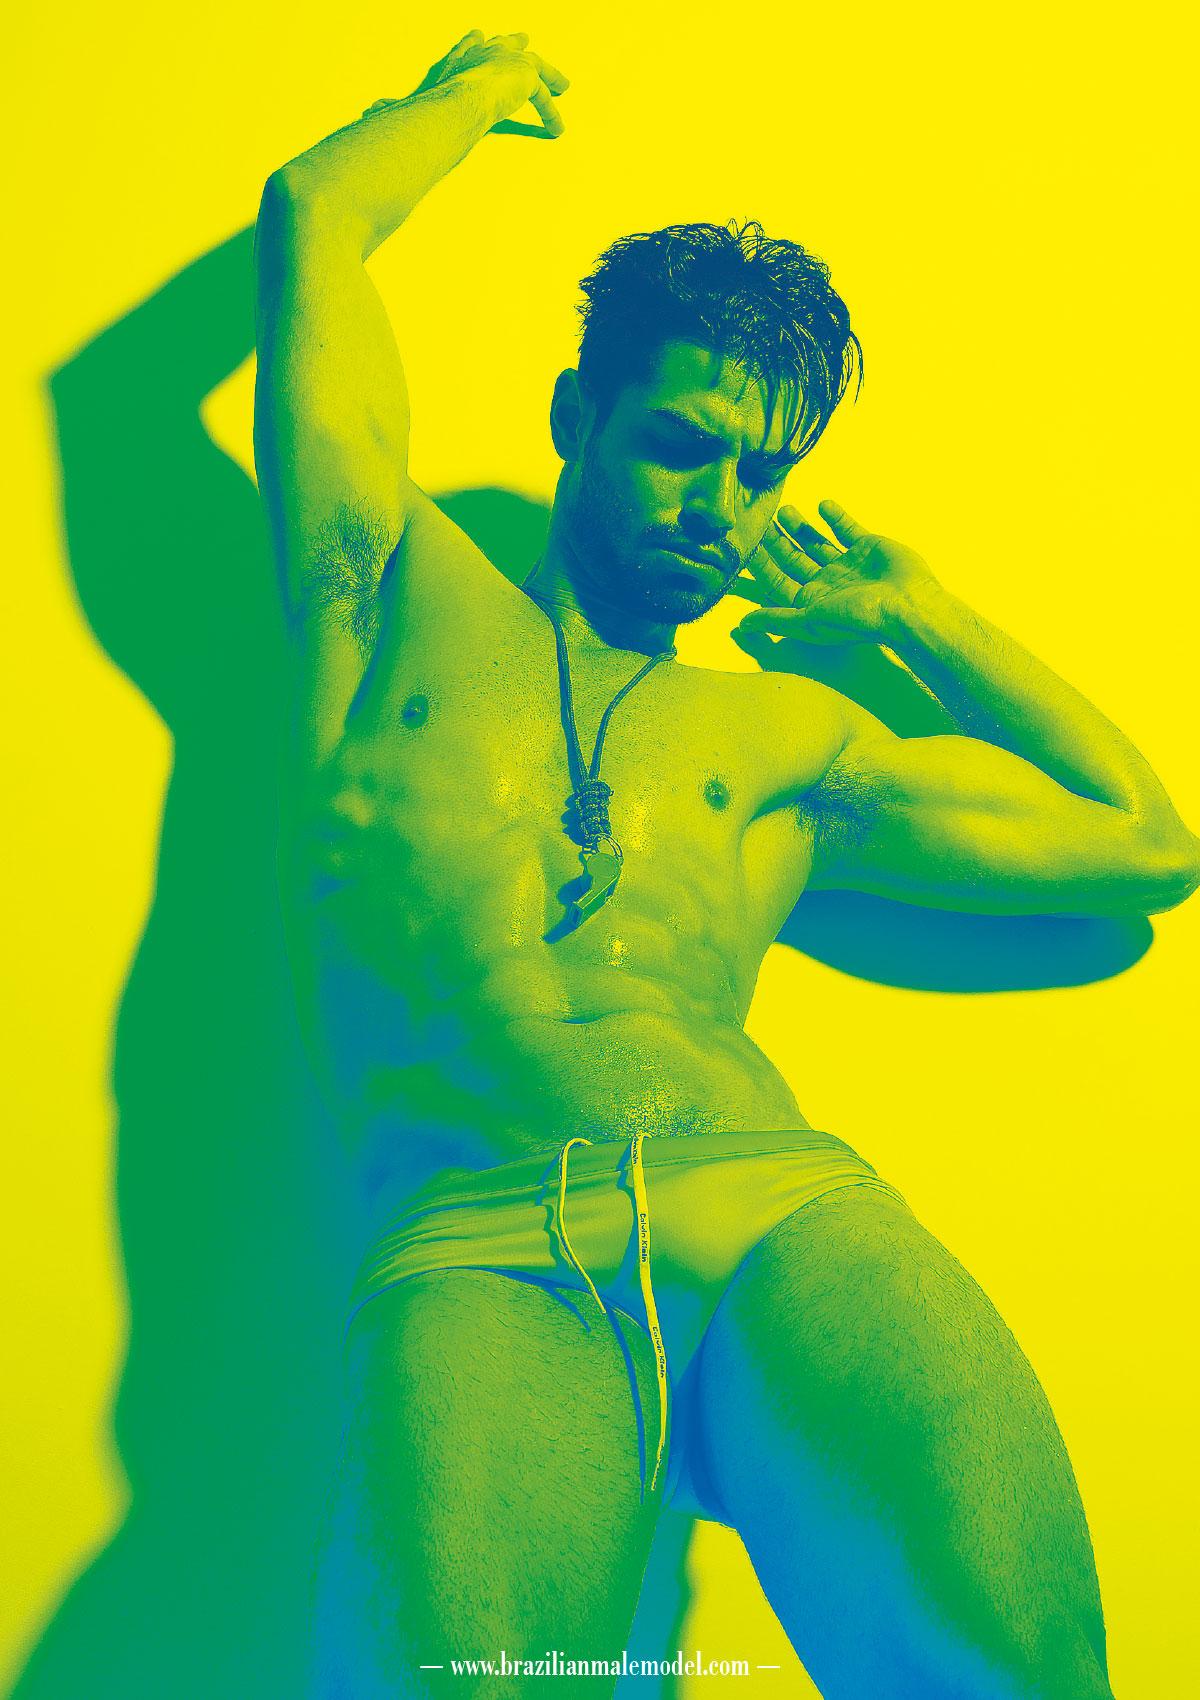 Jonatas Mozer by Kenji Nakamura for Brazilian Male Model Magazine#2